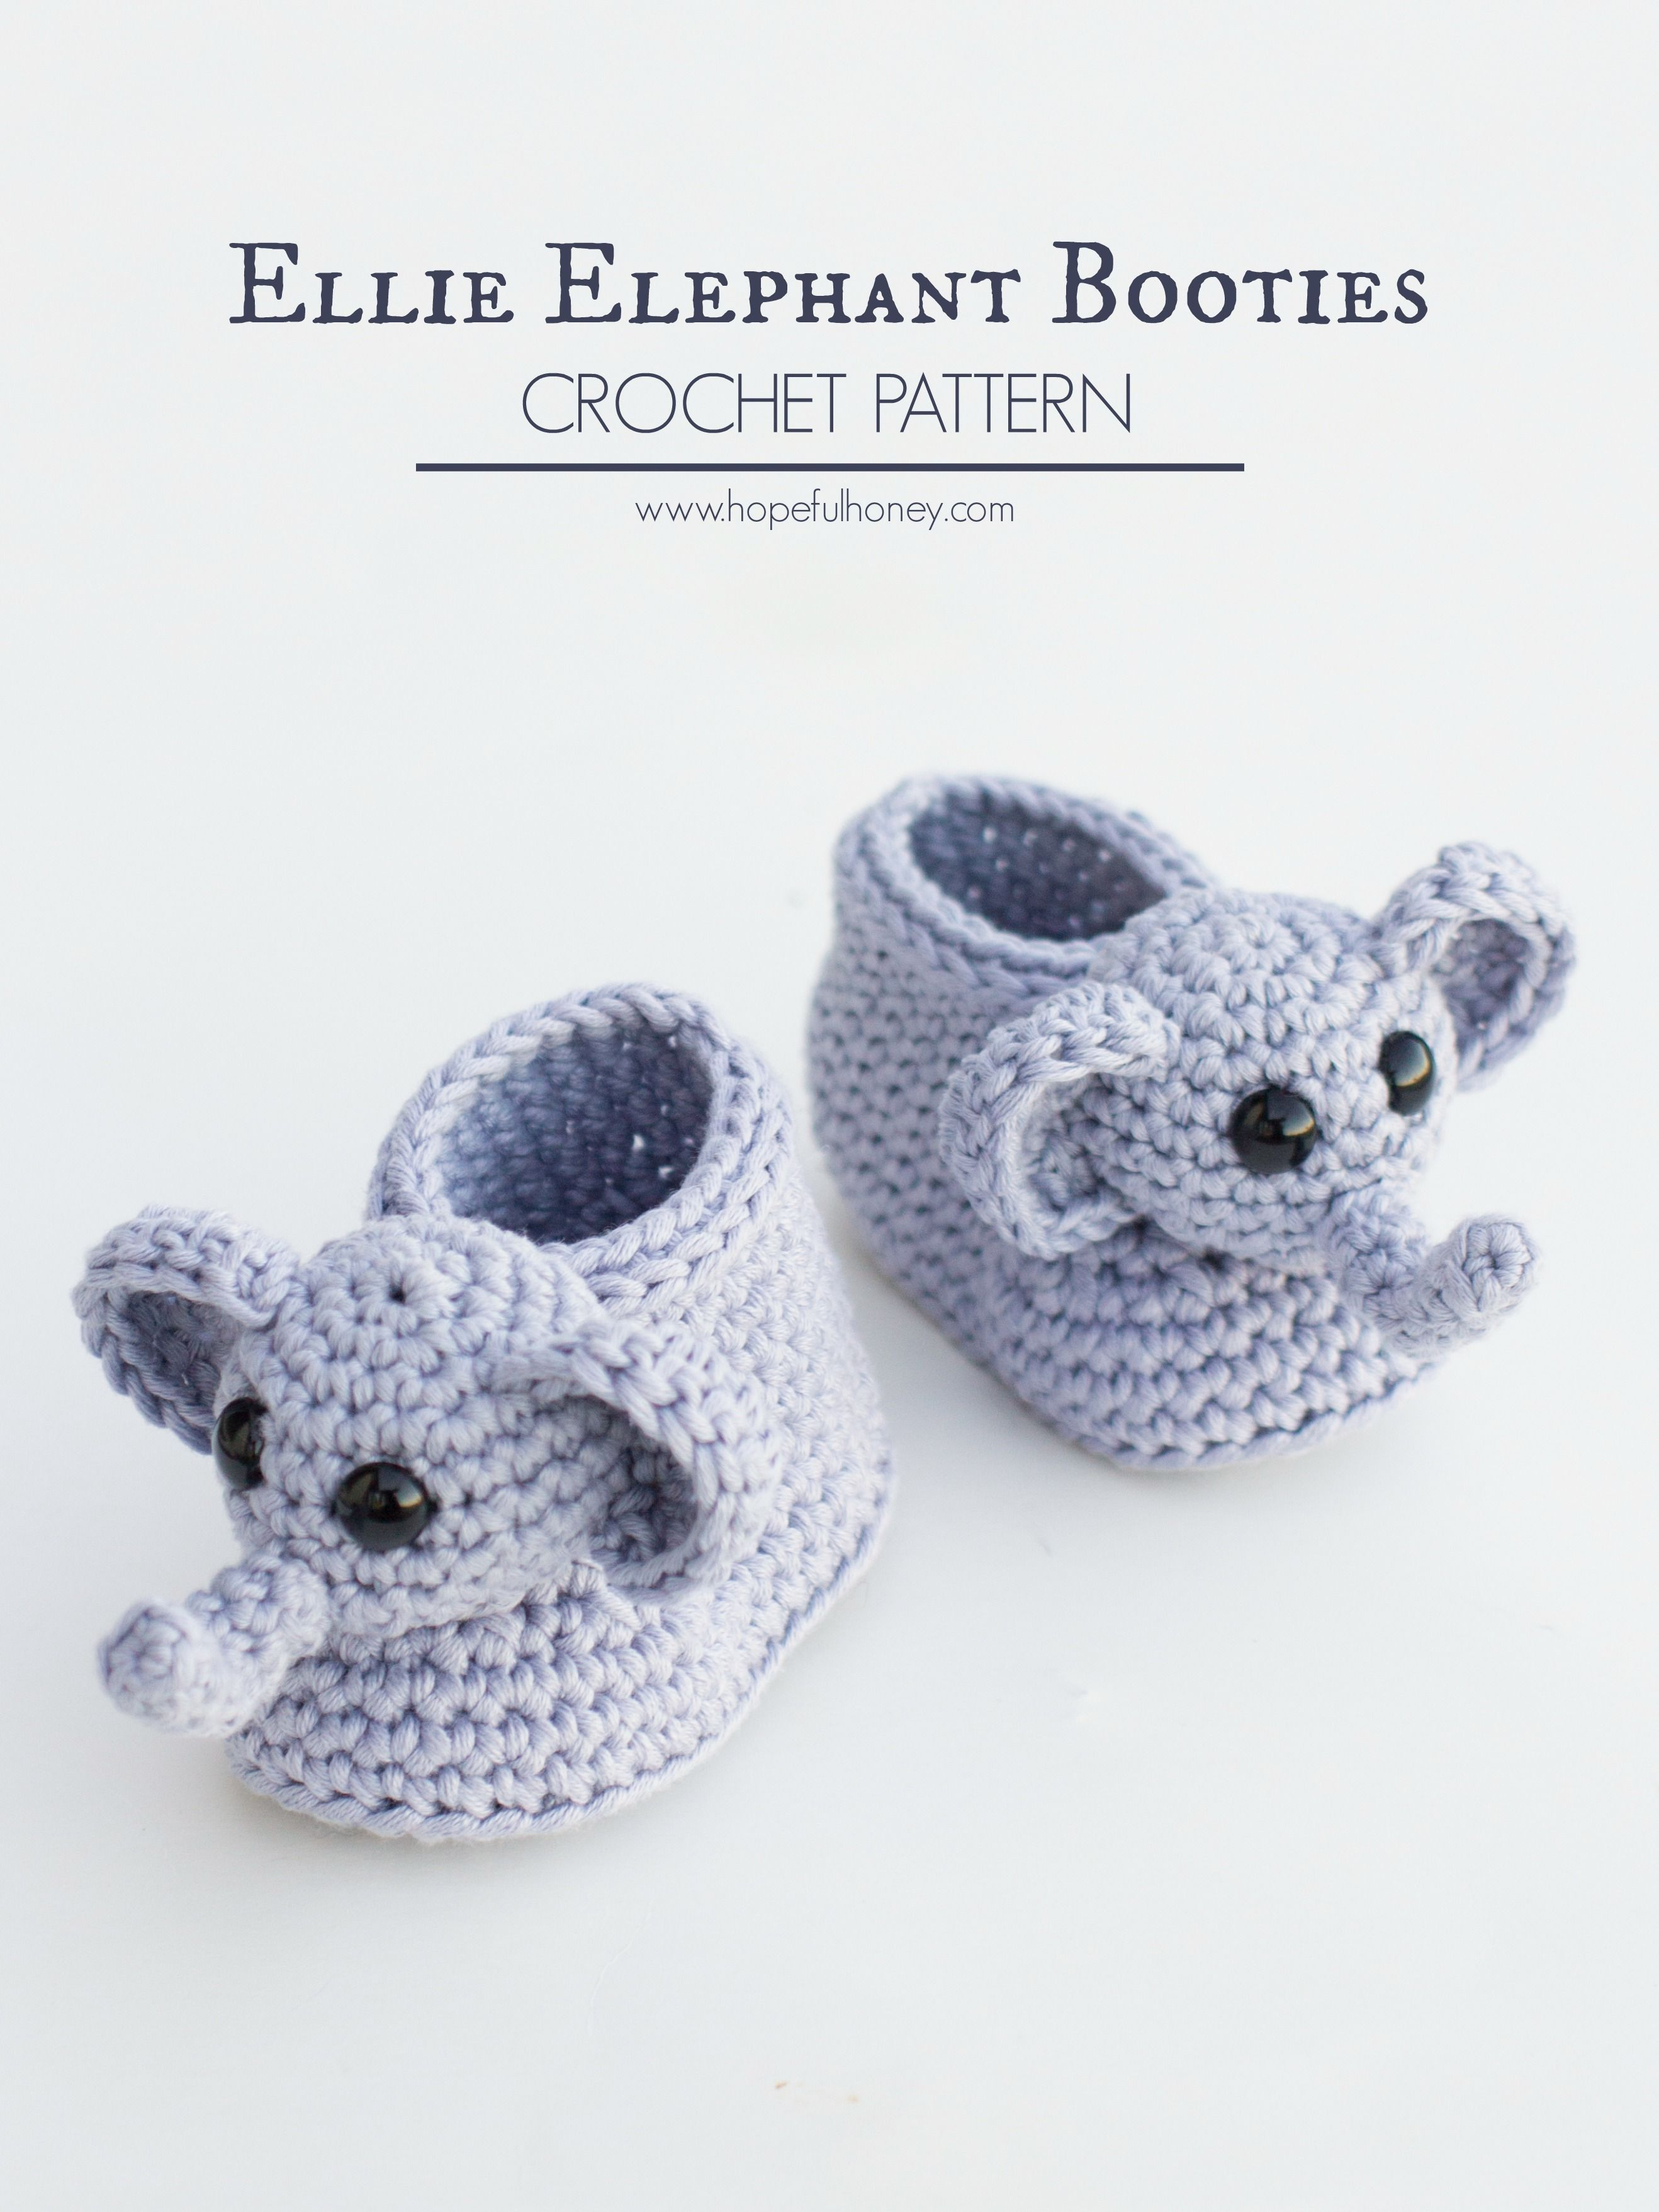 Ellie The Elephant Baby Booties Crochet Pattern   CROCHET   Pinterest